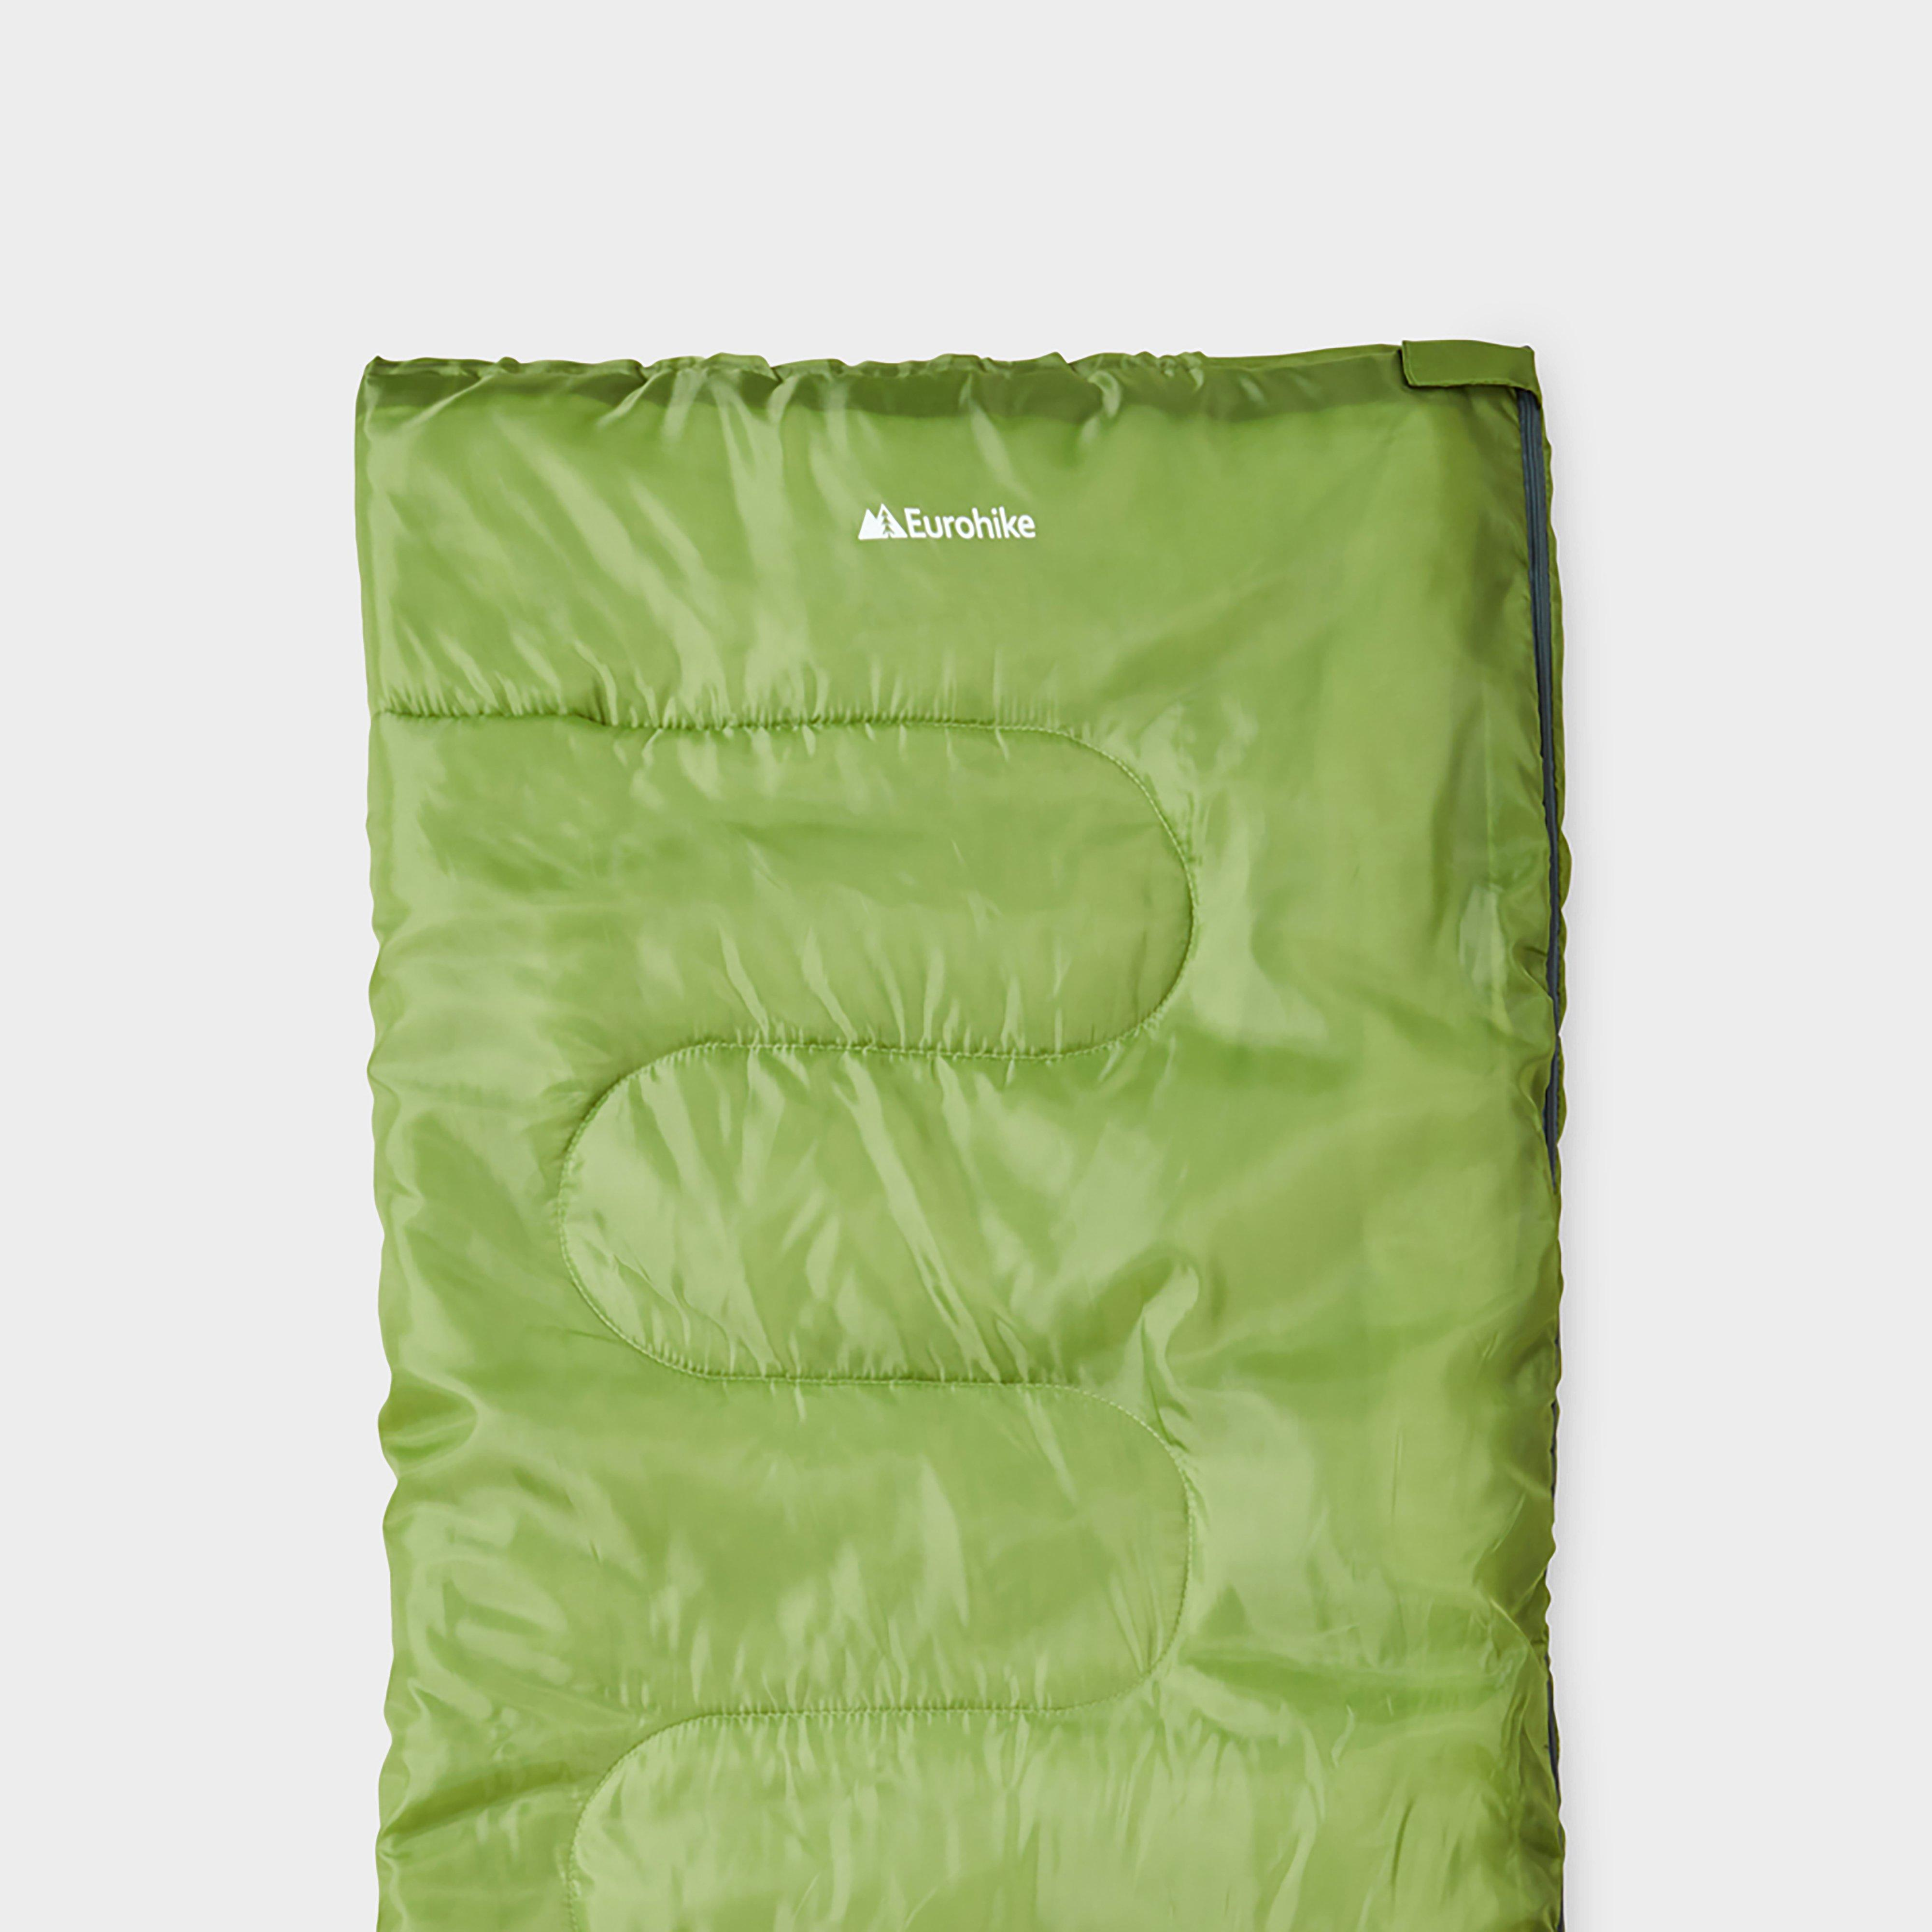 Eurohike Snooze 250 Sleeping Bag - Green/lme  Green/lme